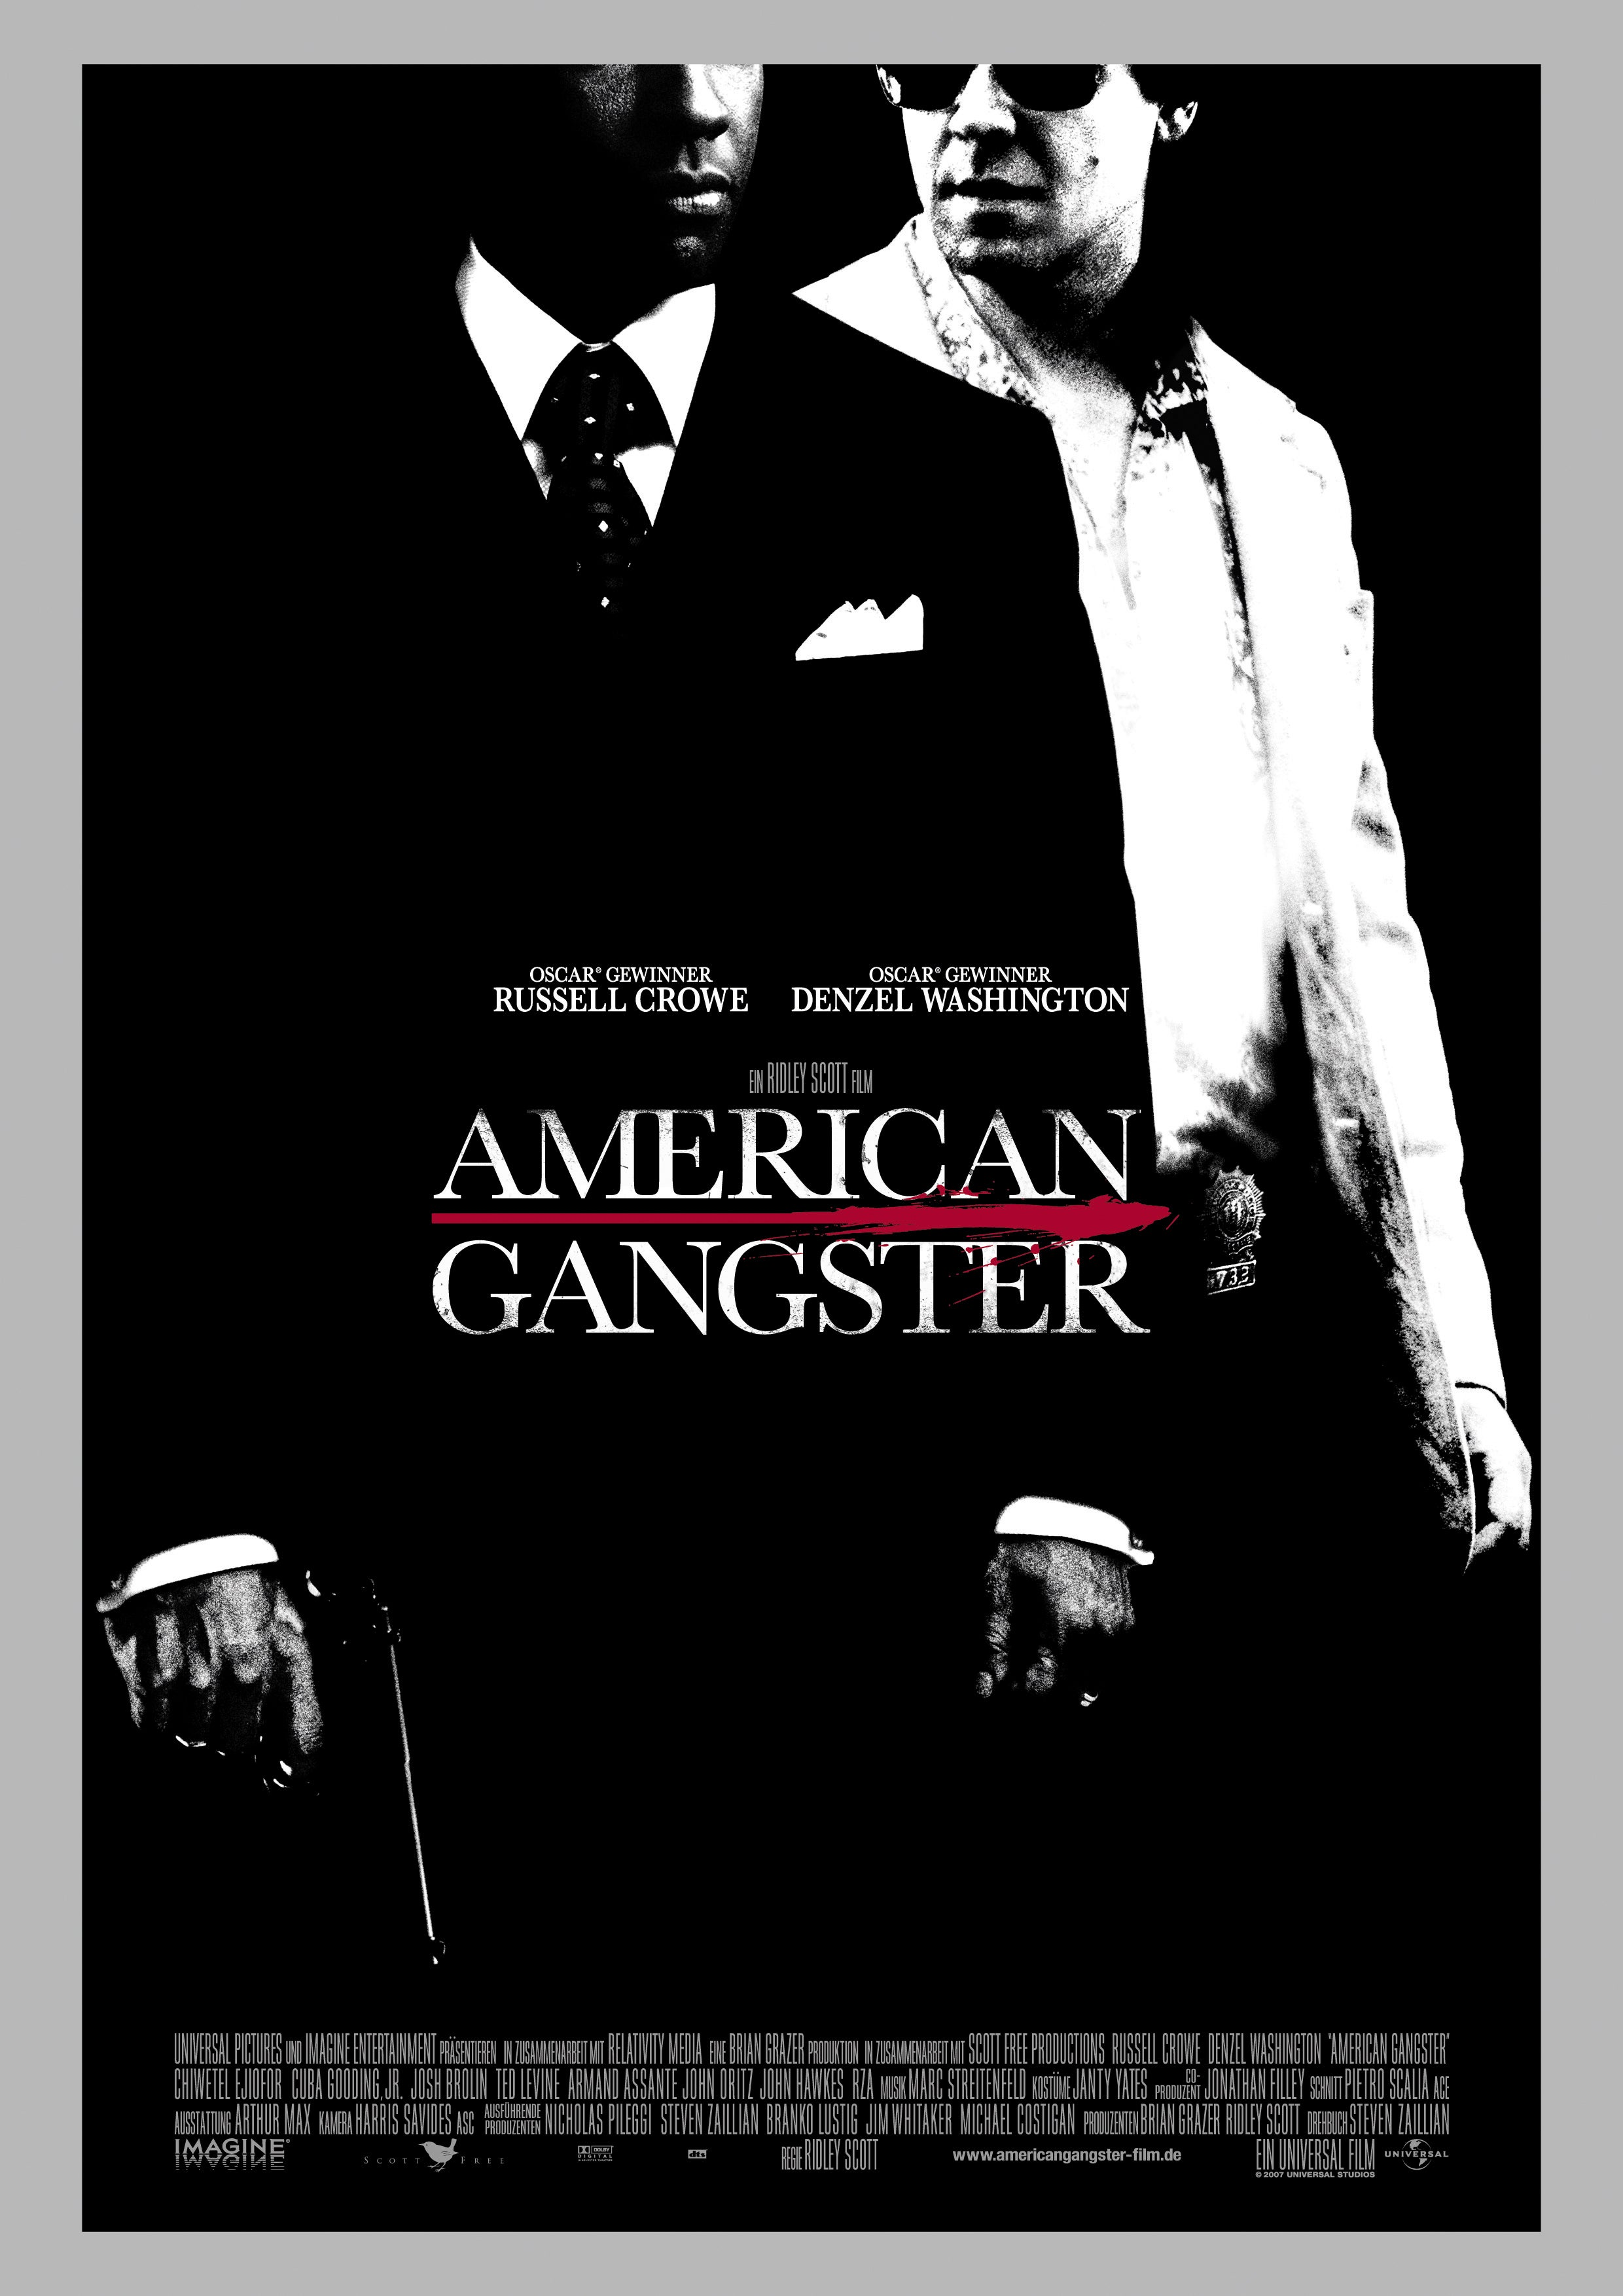 American Gangster | Golden Globes